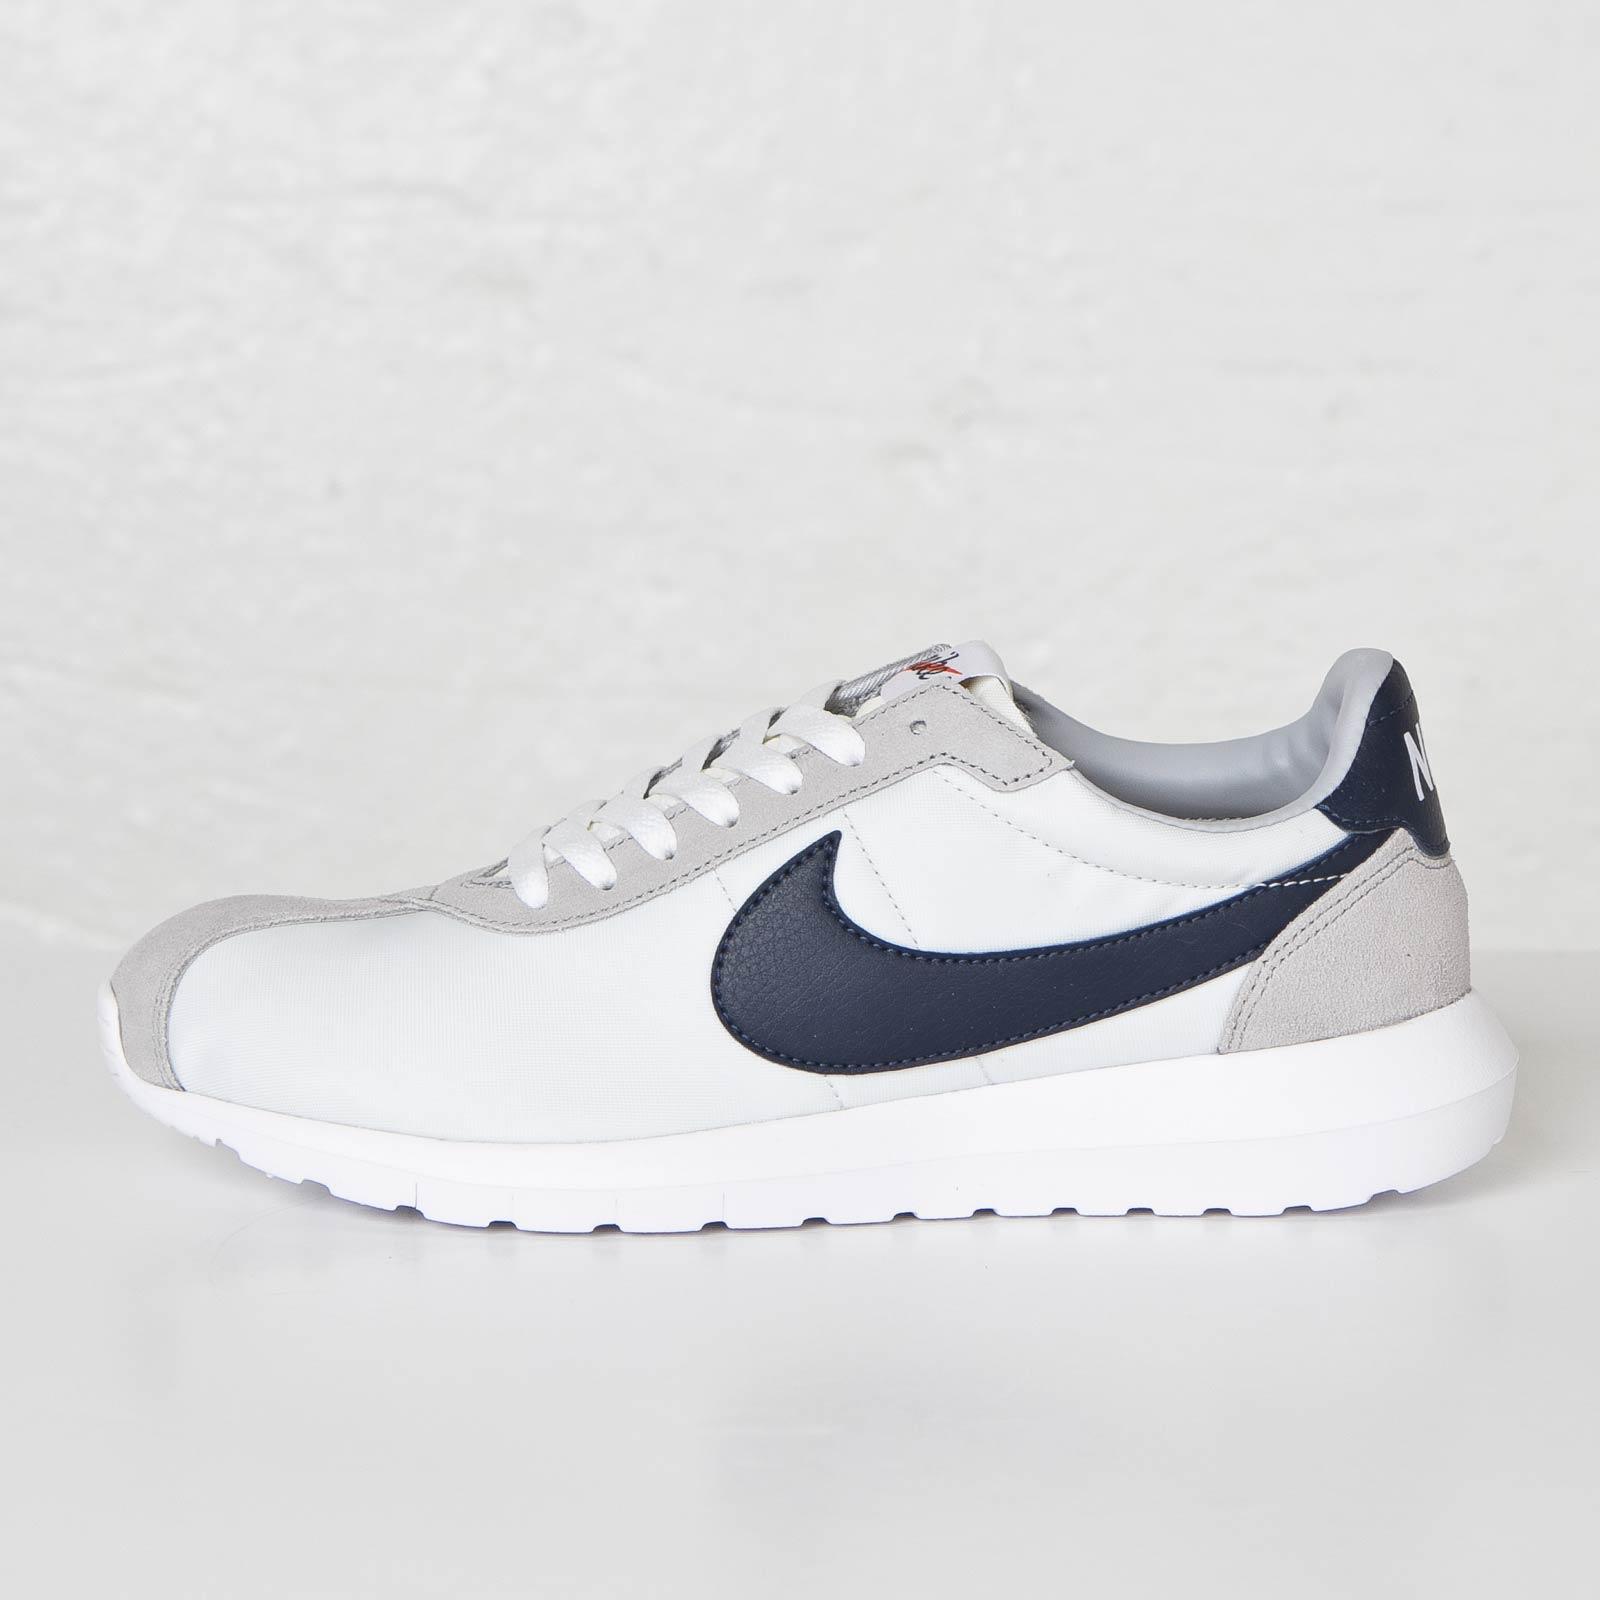 cheap for discount 594b5 1f751 Nike Roshe LD-1000 QS - 802022-002 - Sneakersnstuff   sneakers   streetwear  online since 1999